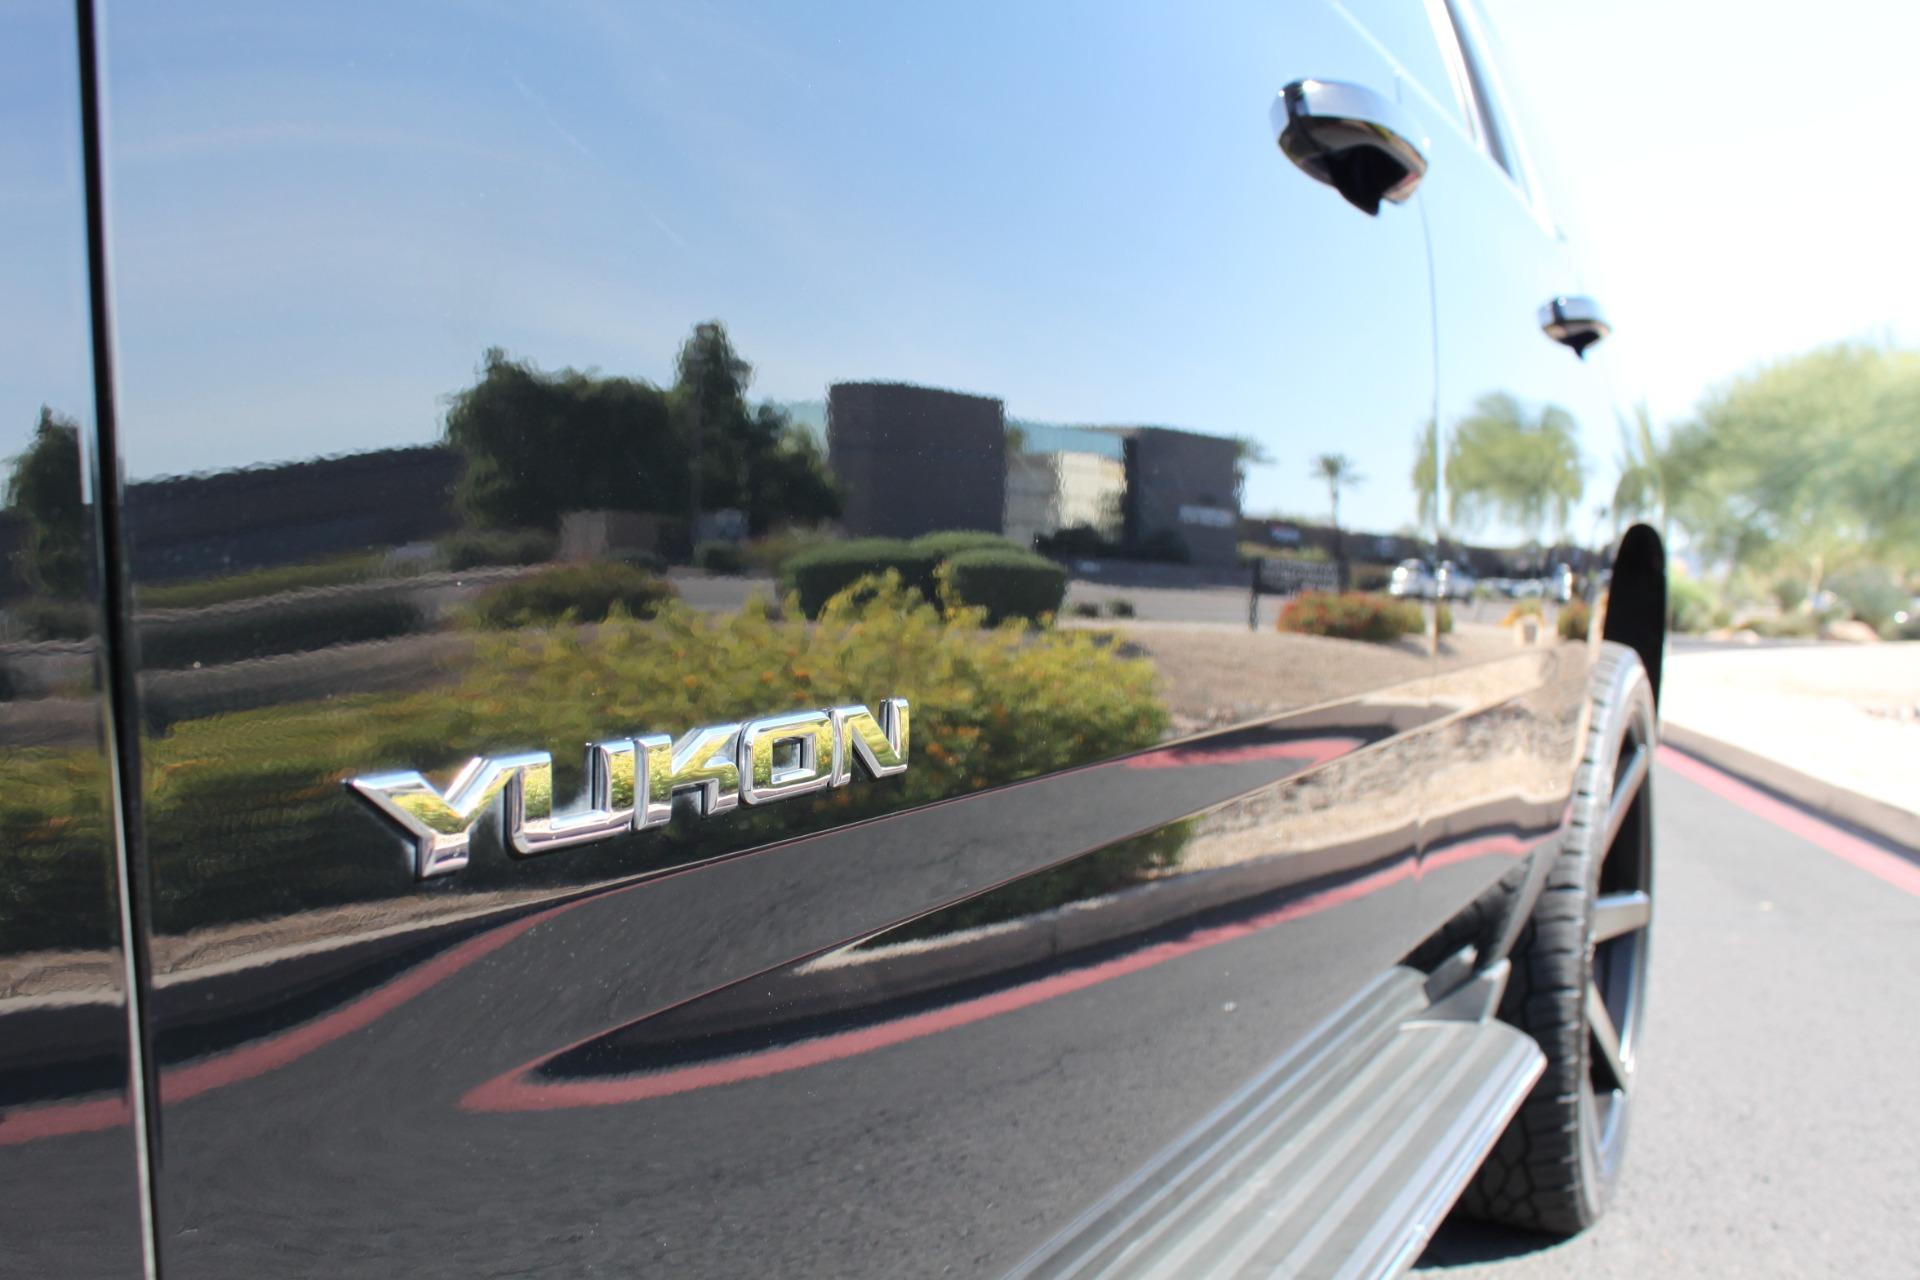 Used-2015-GMC-Yukon-SLT-XJ